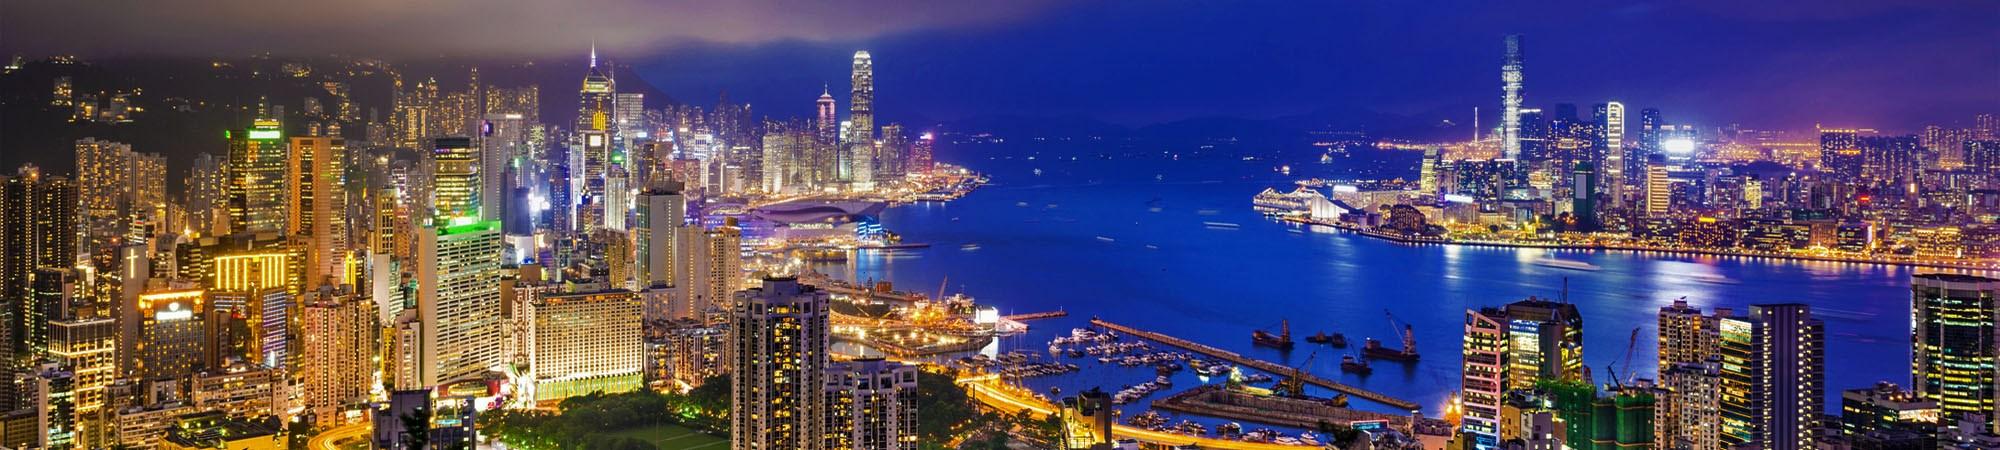 Luxury Travel Package by Explorient: Bangkok, Singapore, Bangkok & Cambodia Tour